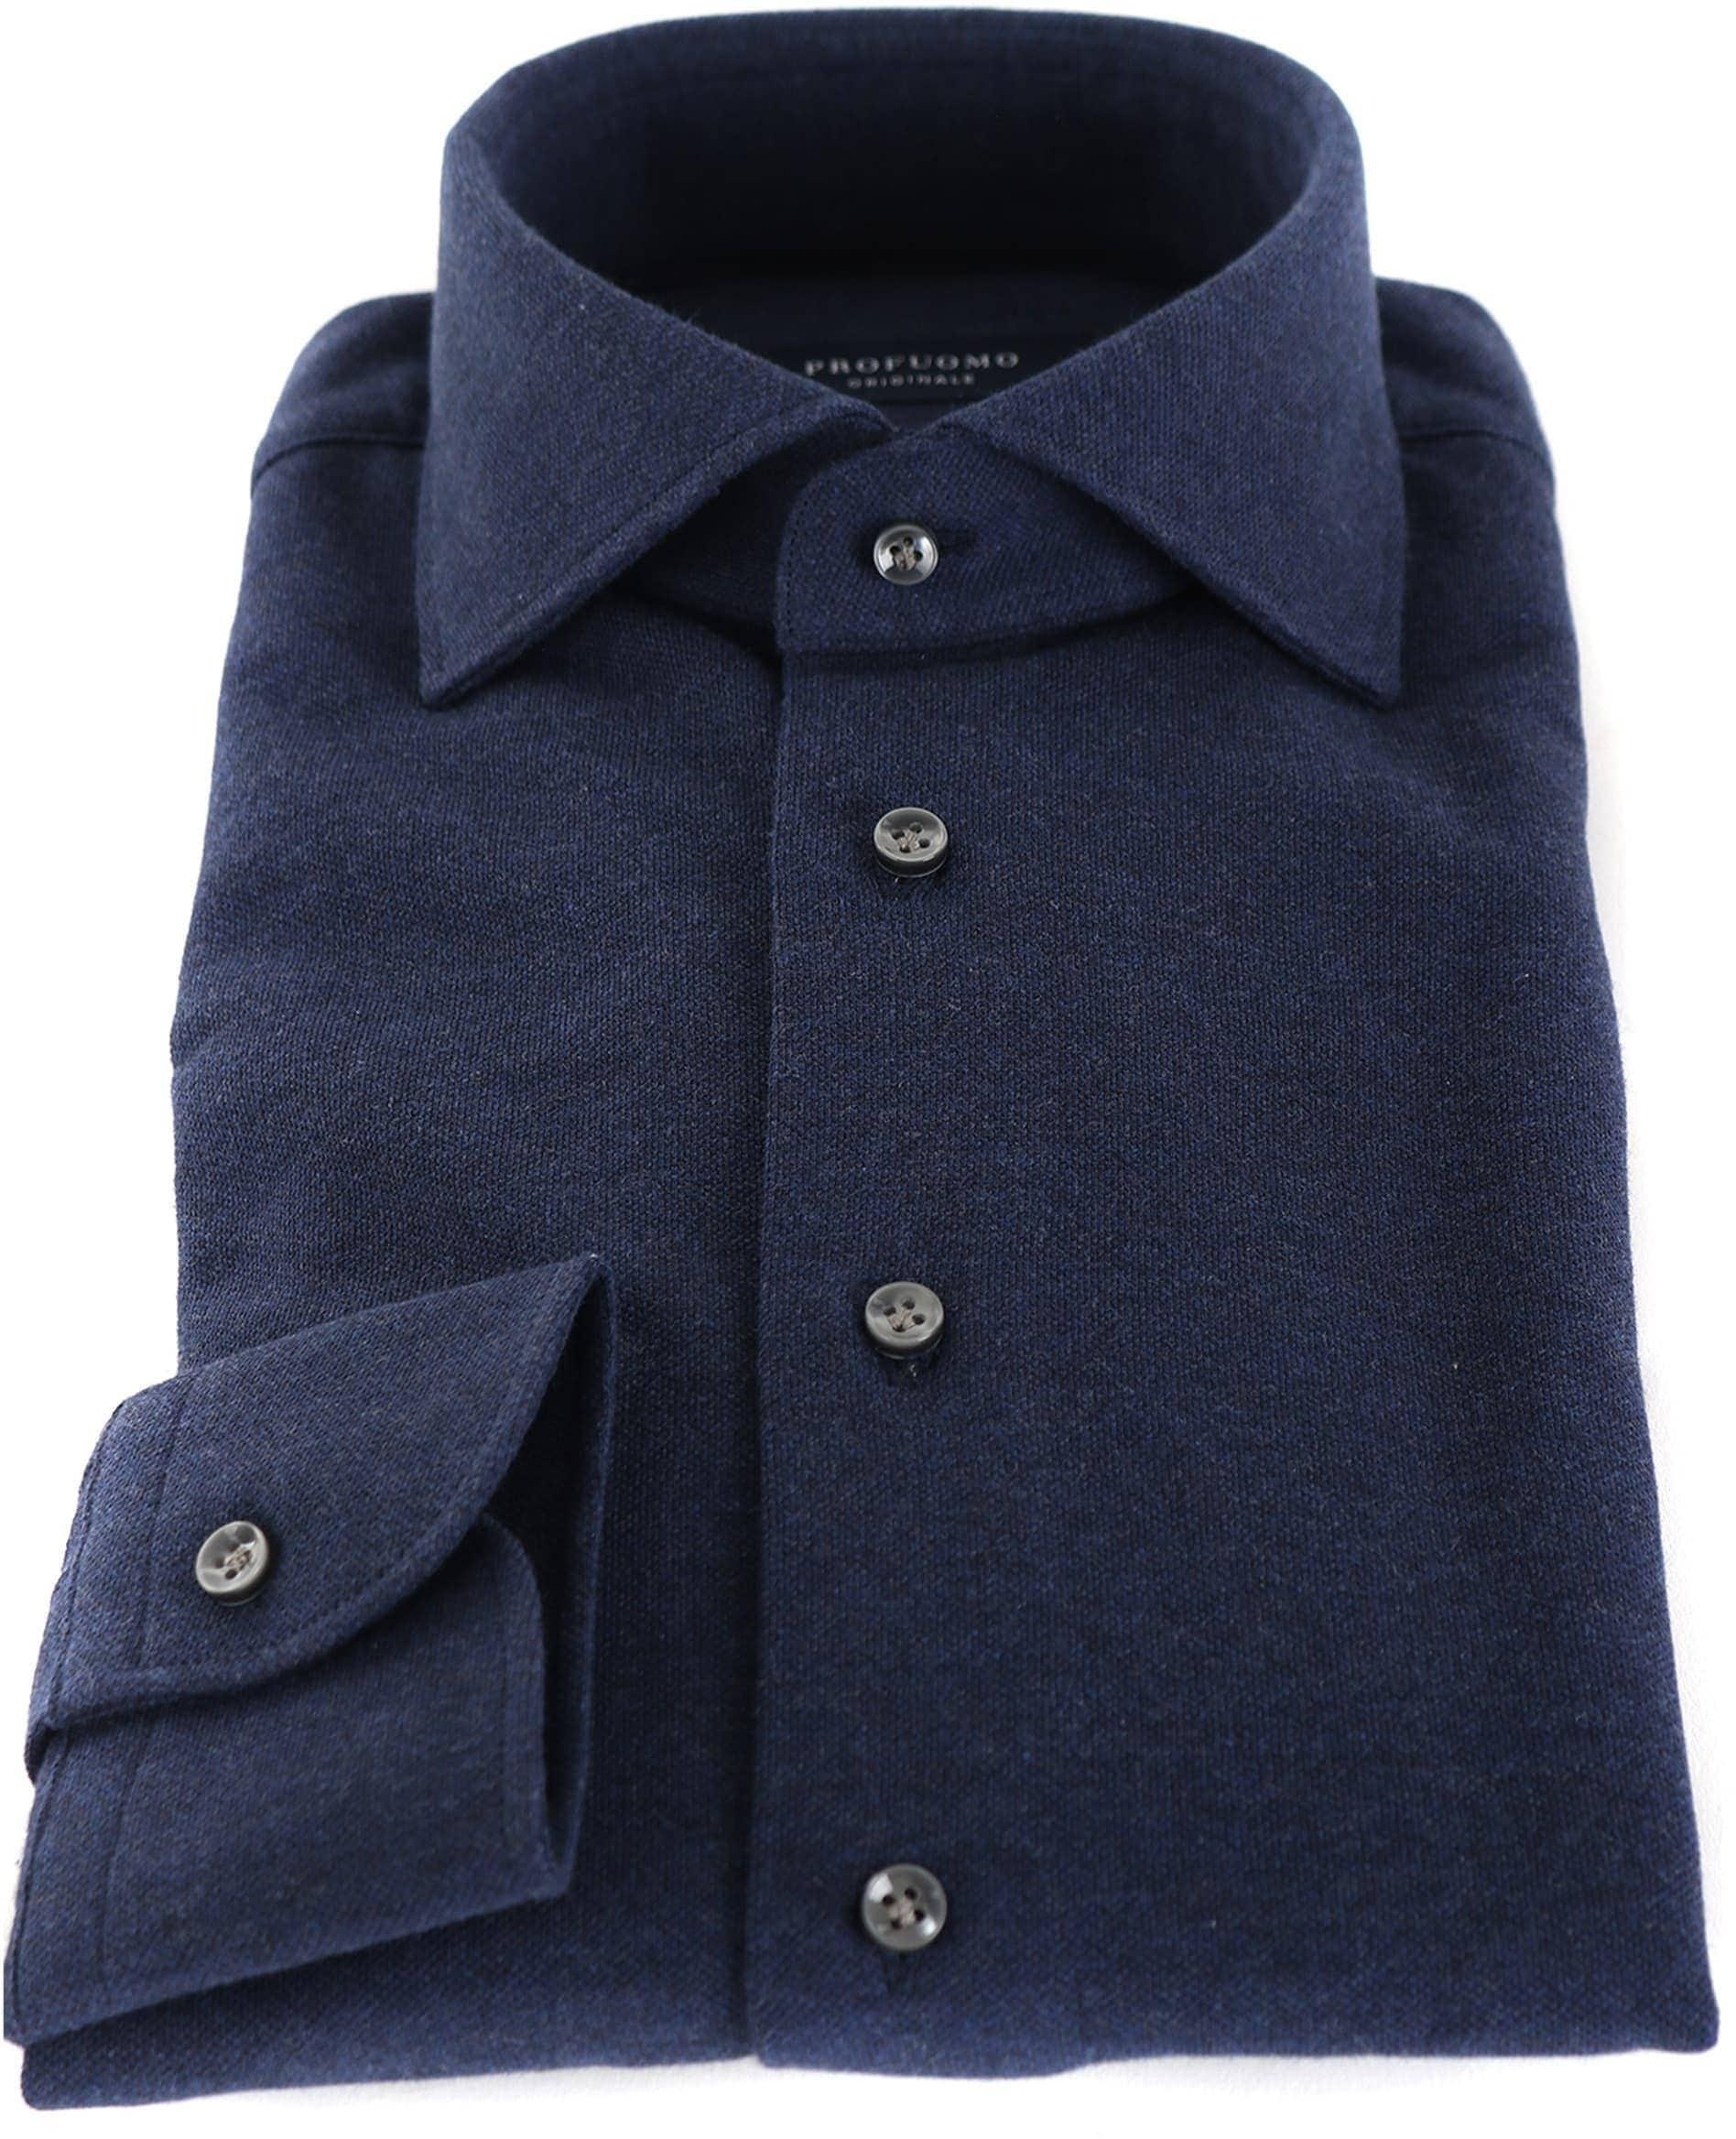 Profuomo Hemd Knitted Slim Fit Dunkelblau Foto 1